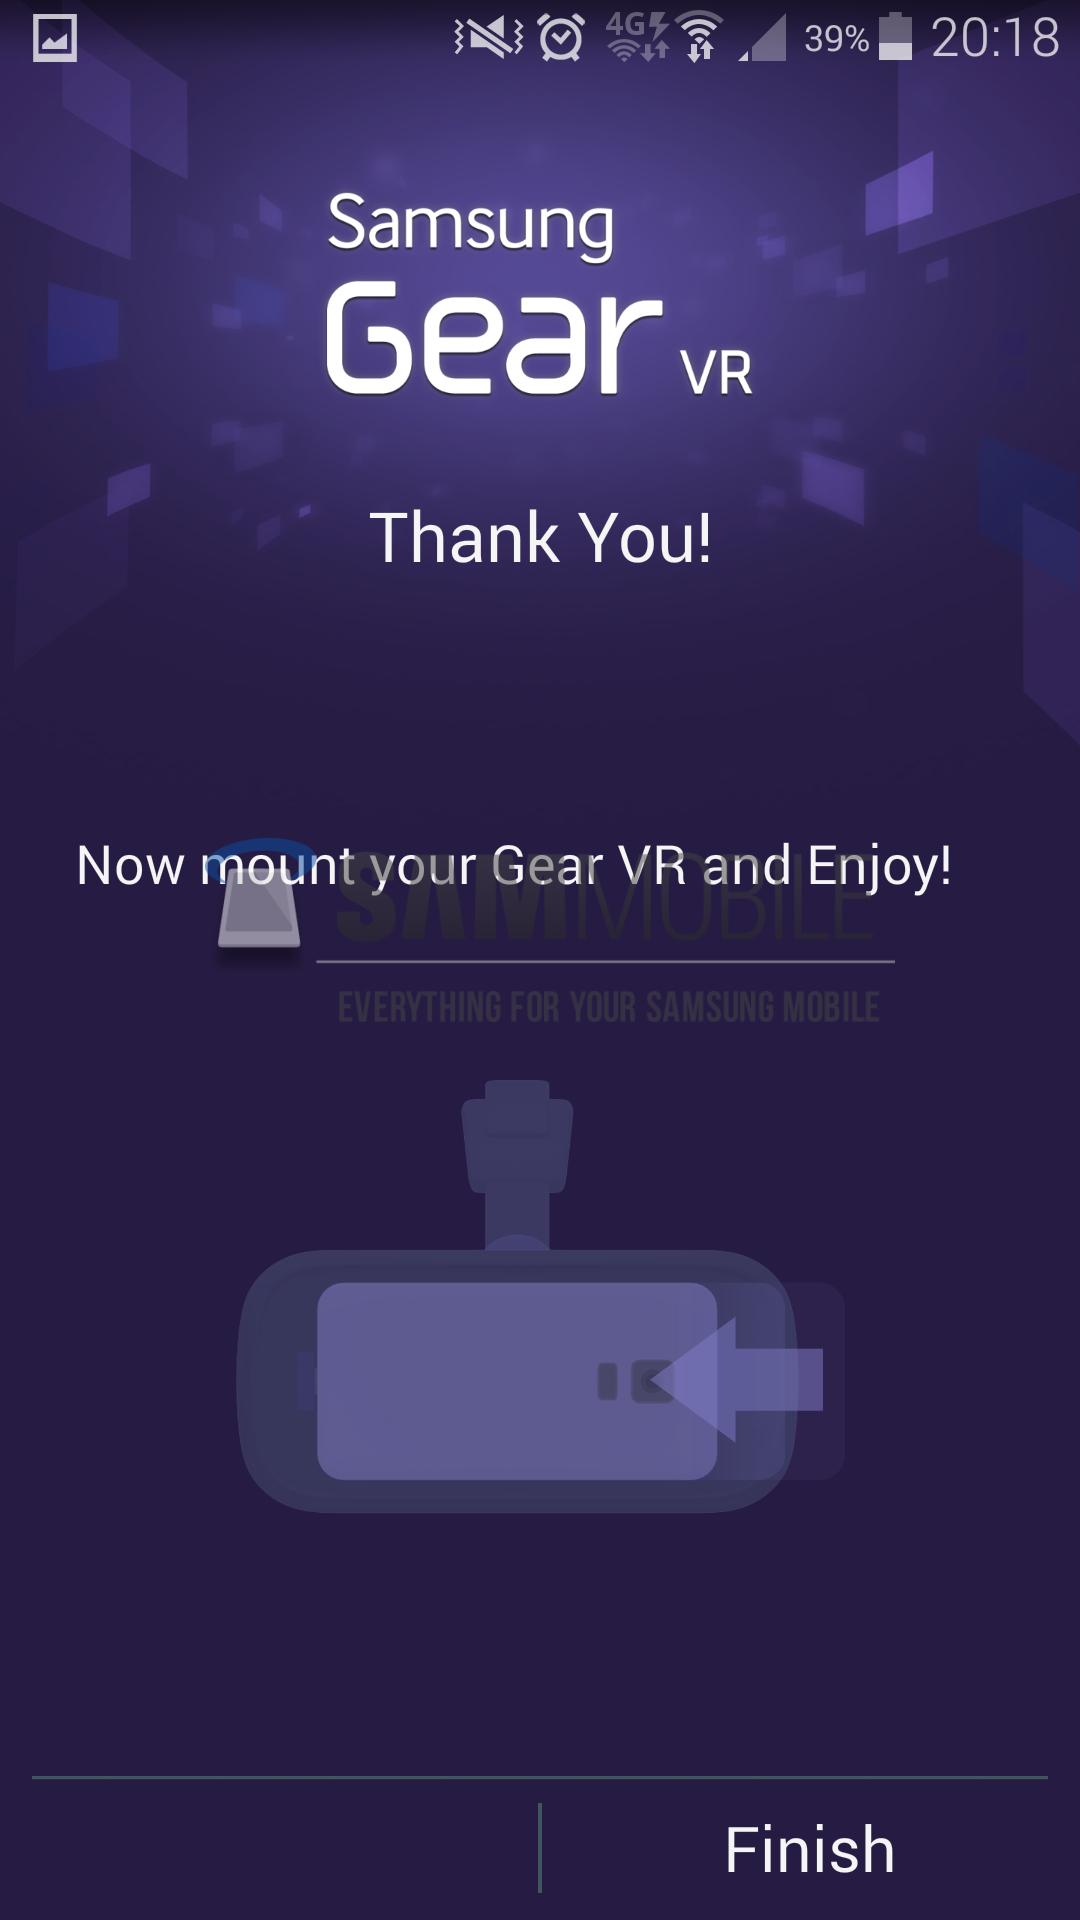 Samsung Gear VR 07